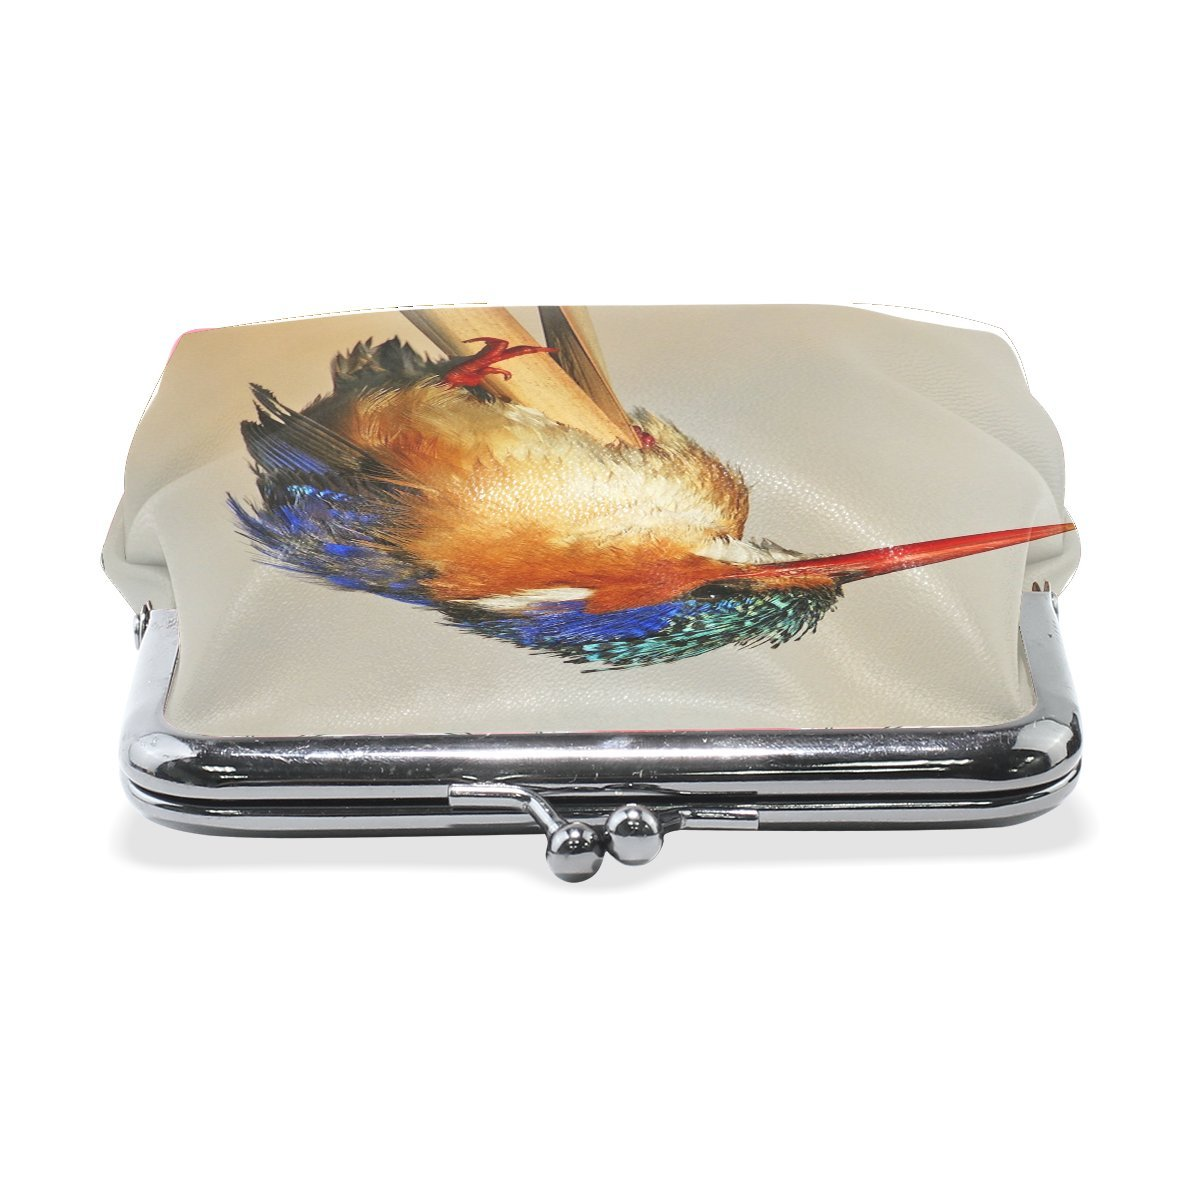 Women Animal Brid Kingfisher Colorful Print Wallet Exquisite Clasp Coin Purse Girls Clutch Handbag